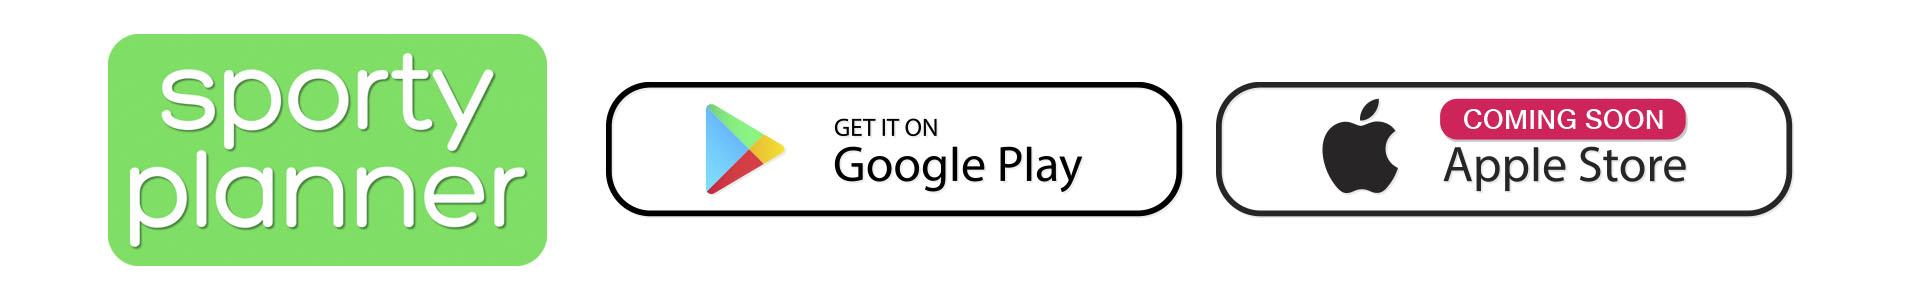 Sportyplanner_Play ja IOS_1920x300